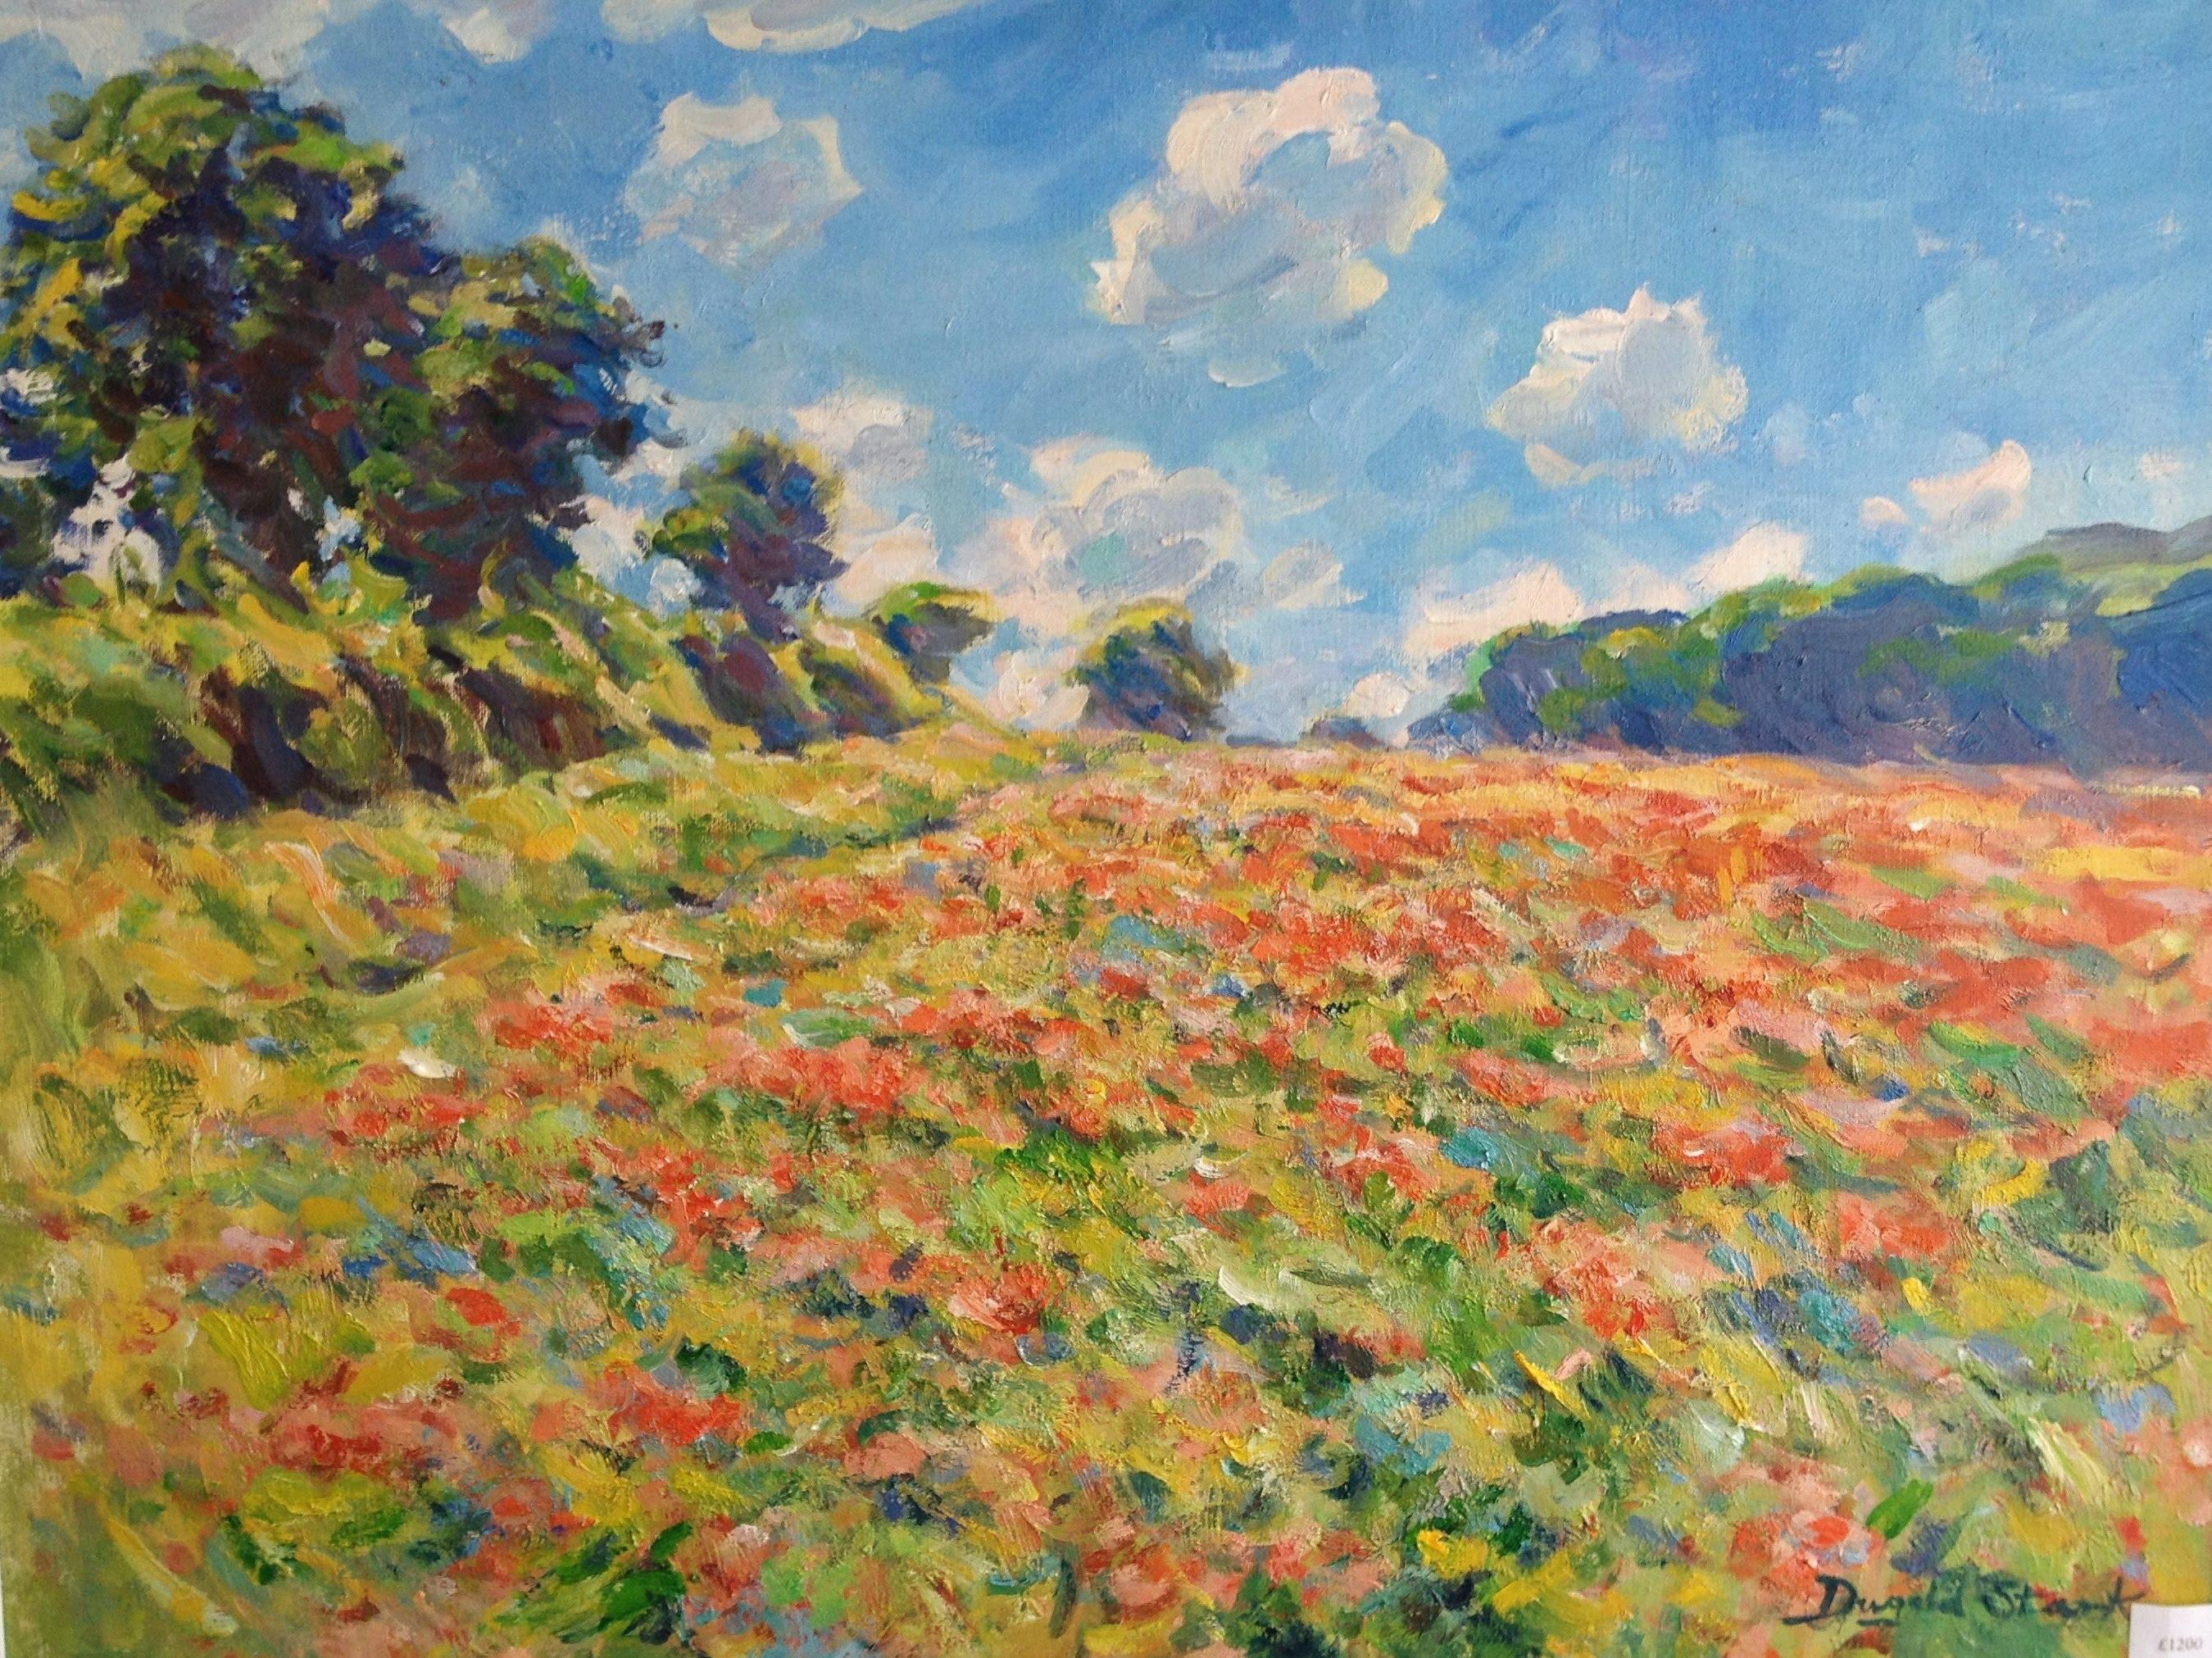 Wind through the Poppy Field